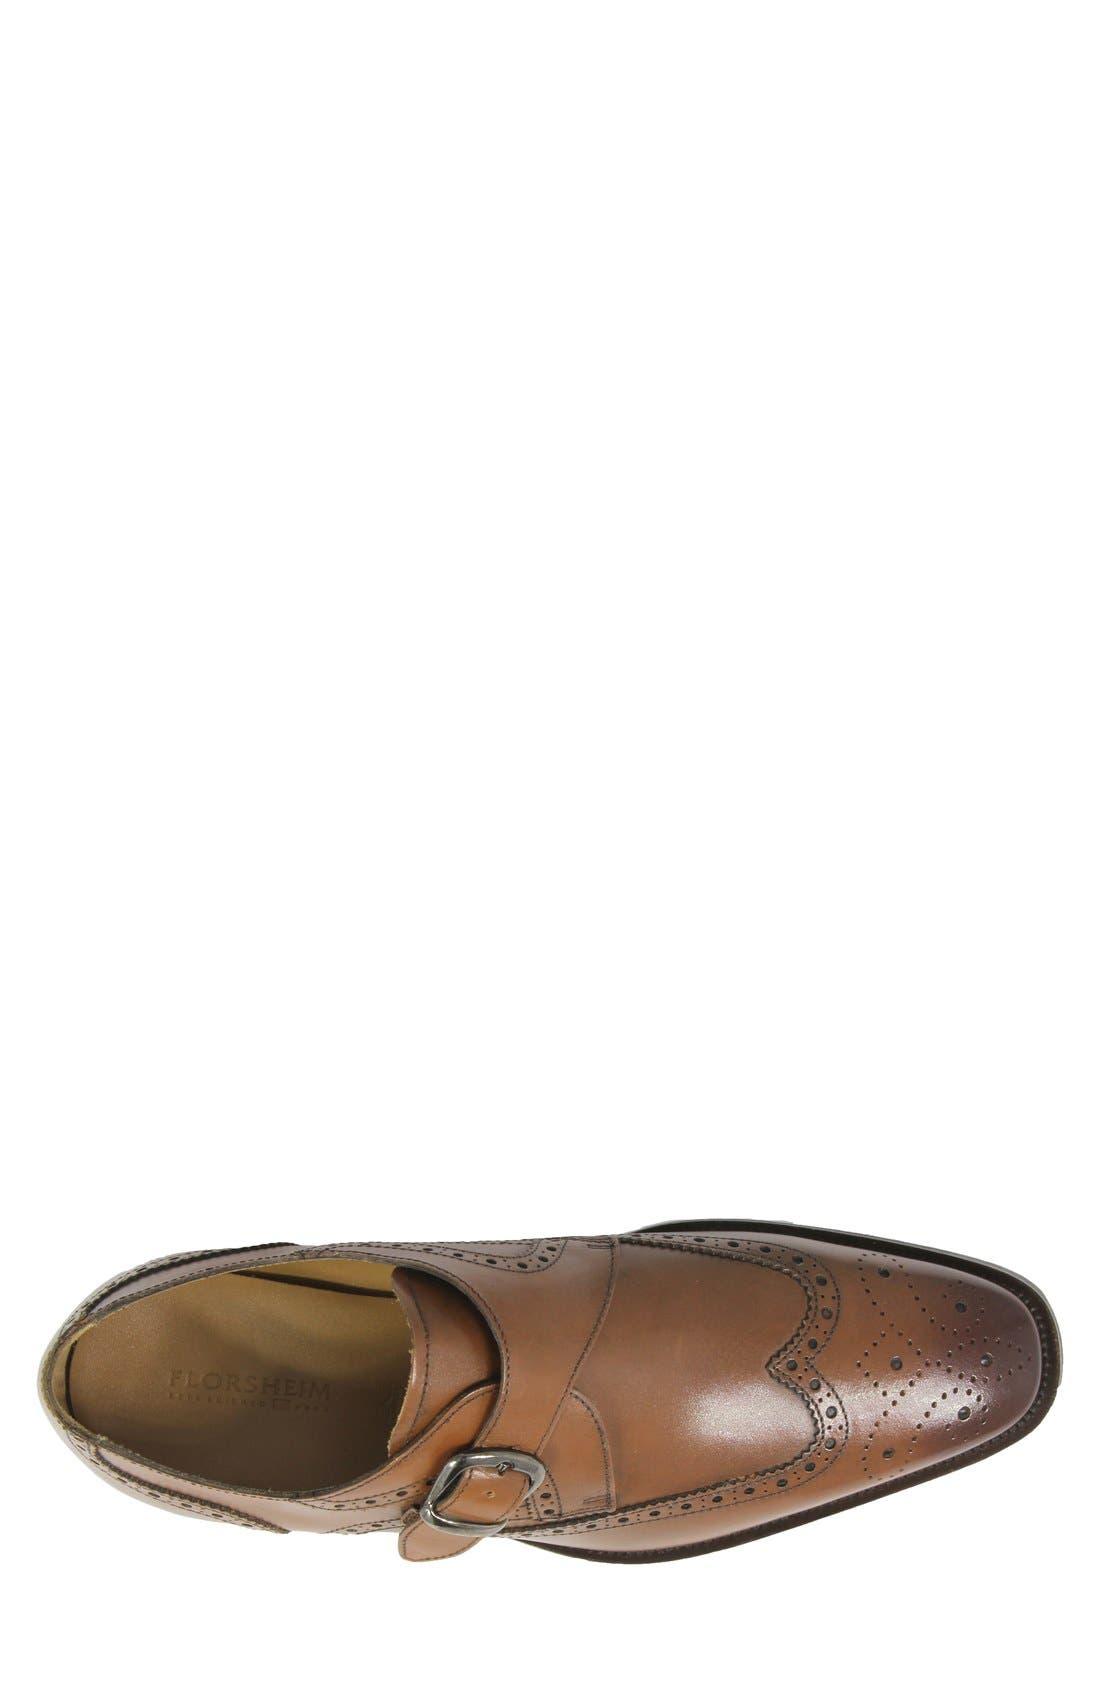 'Sabato' Wingtip Monk Strap Shoe,                             Alternate thumbnail 3, color,                             MEDIUM BROWN